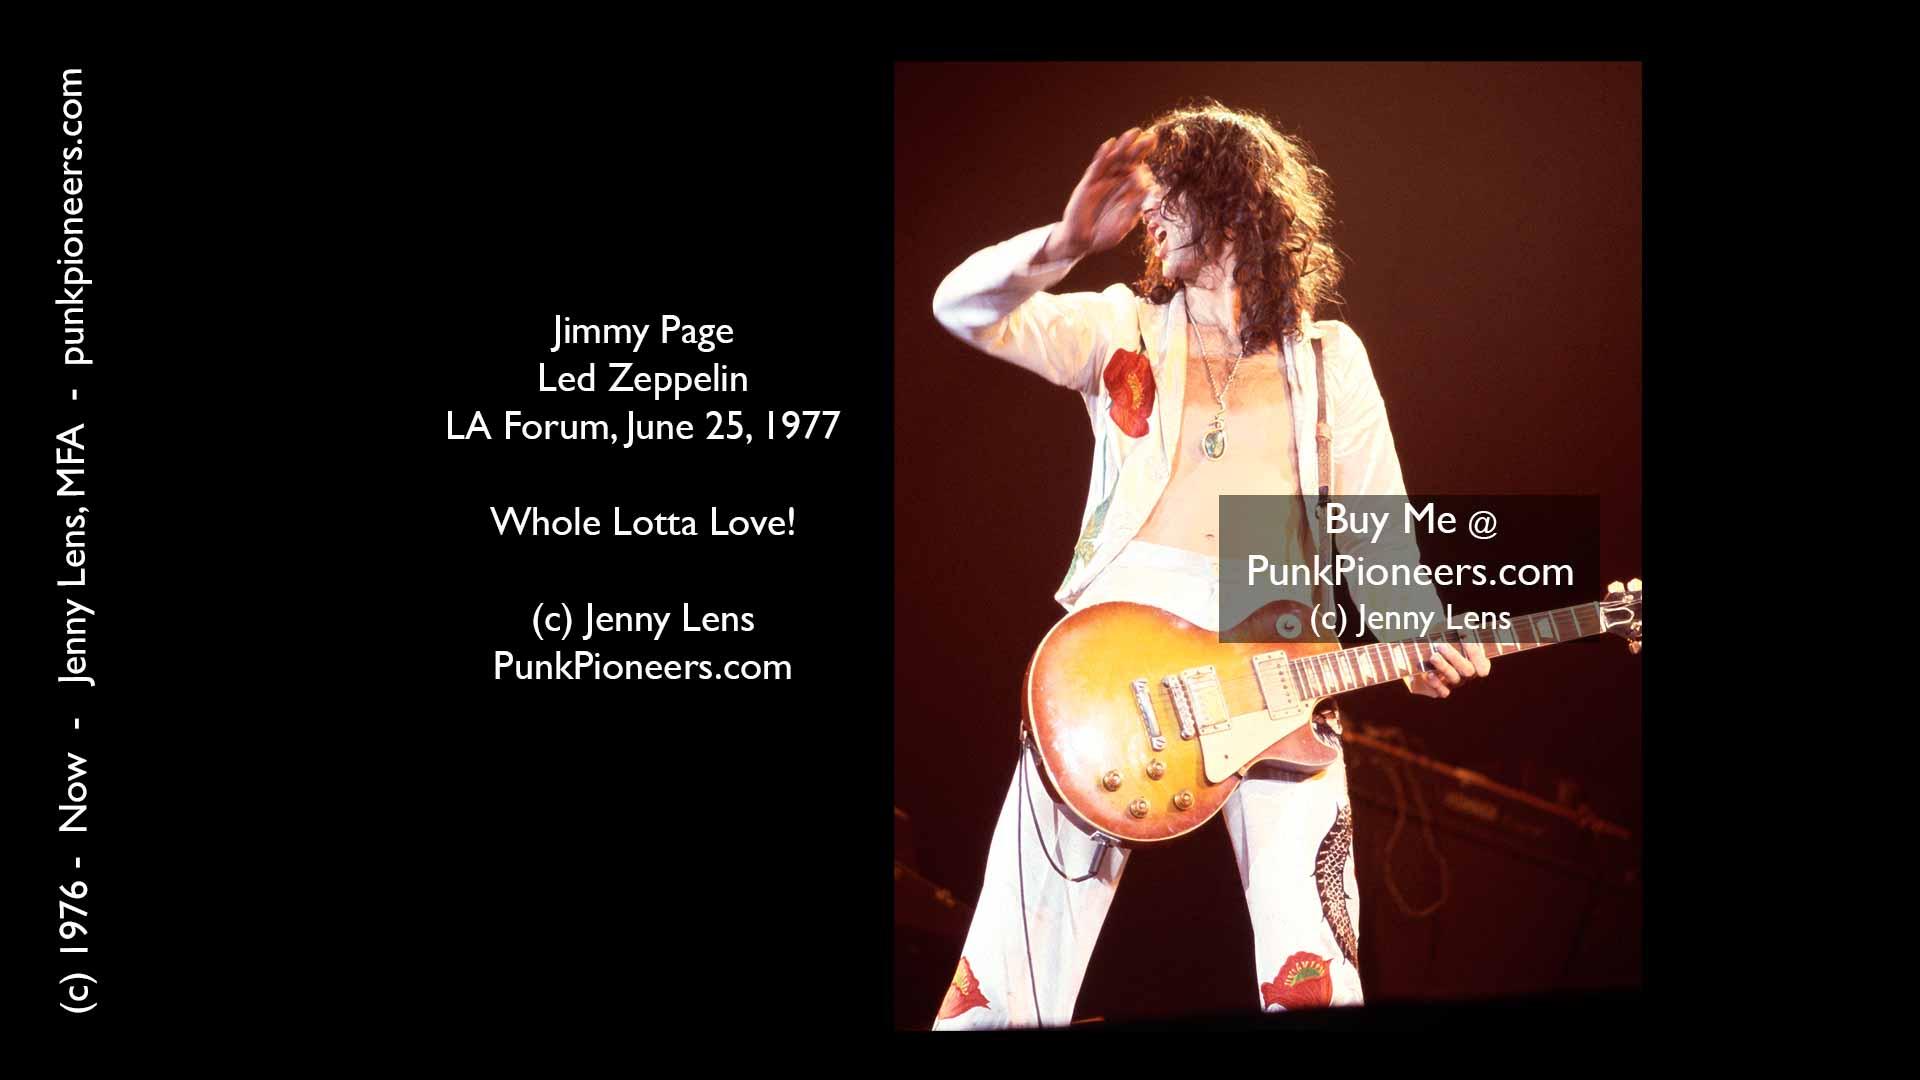 Led Zeppelin, Jimmy Page, LA Forum, June 25, 1977, Jenny Lens, PunkPioneers.com